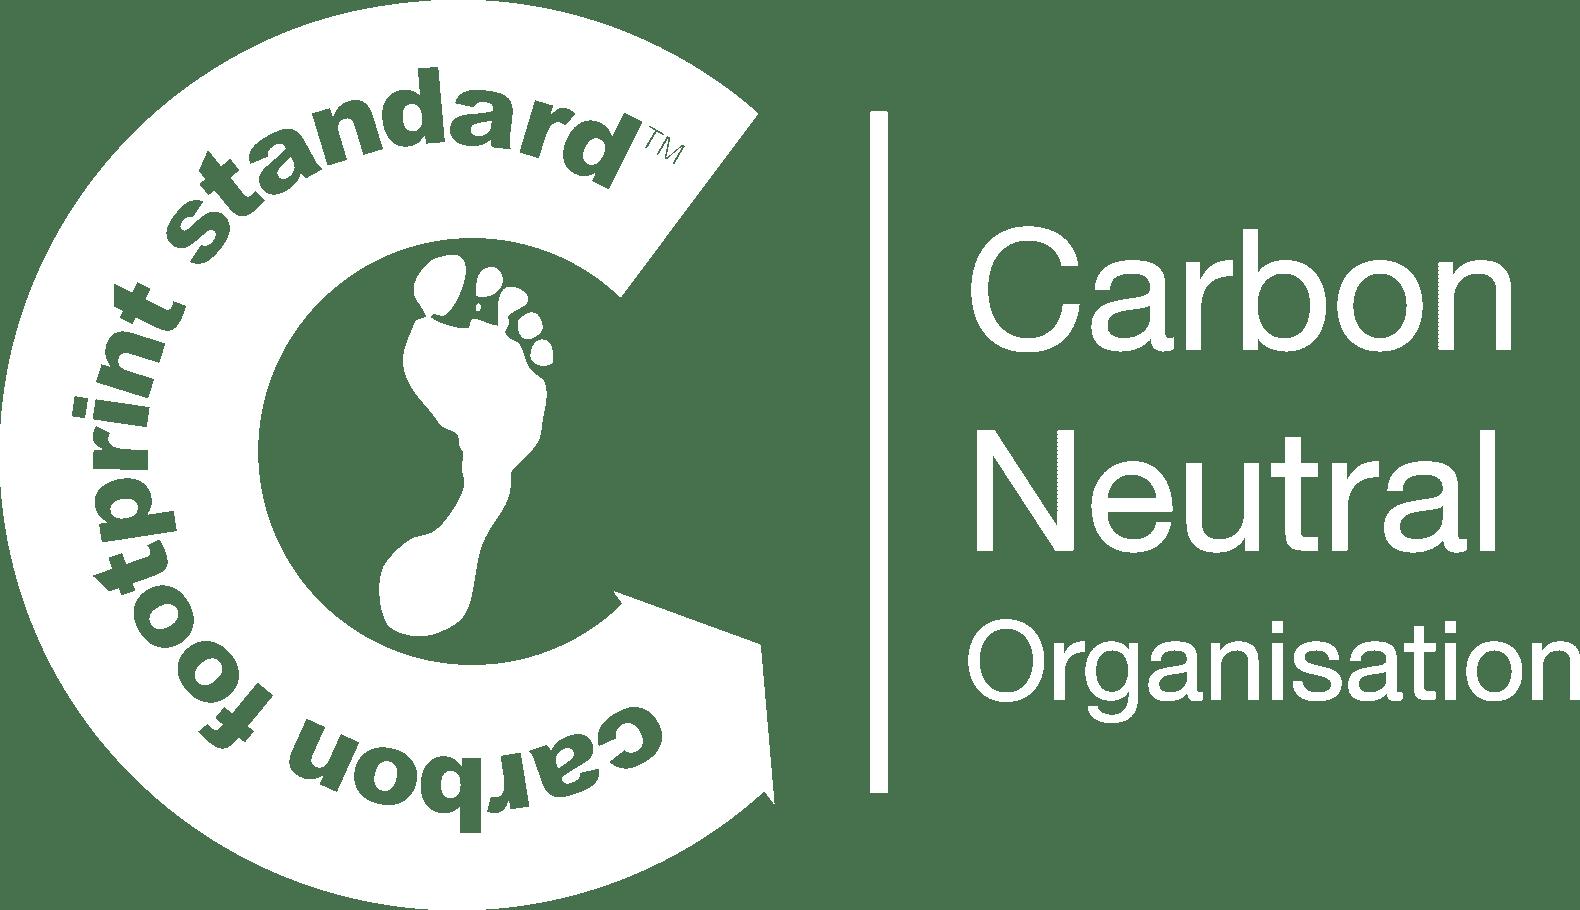 Carbon Neutral Organisation logo